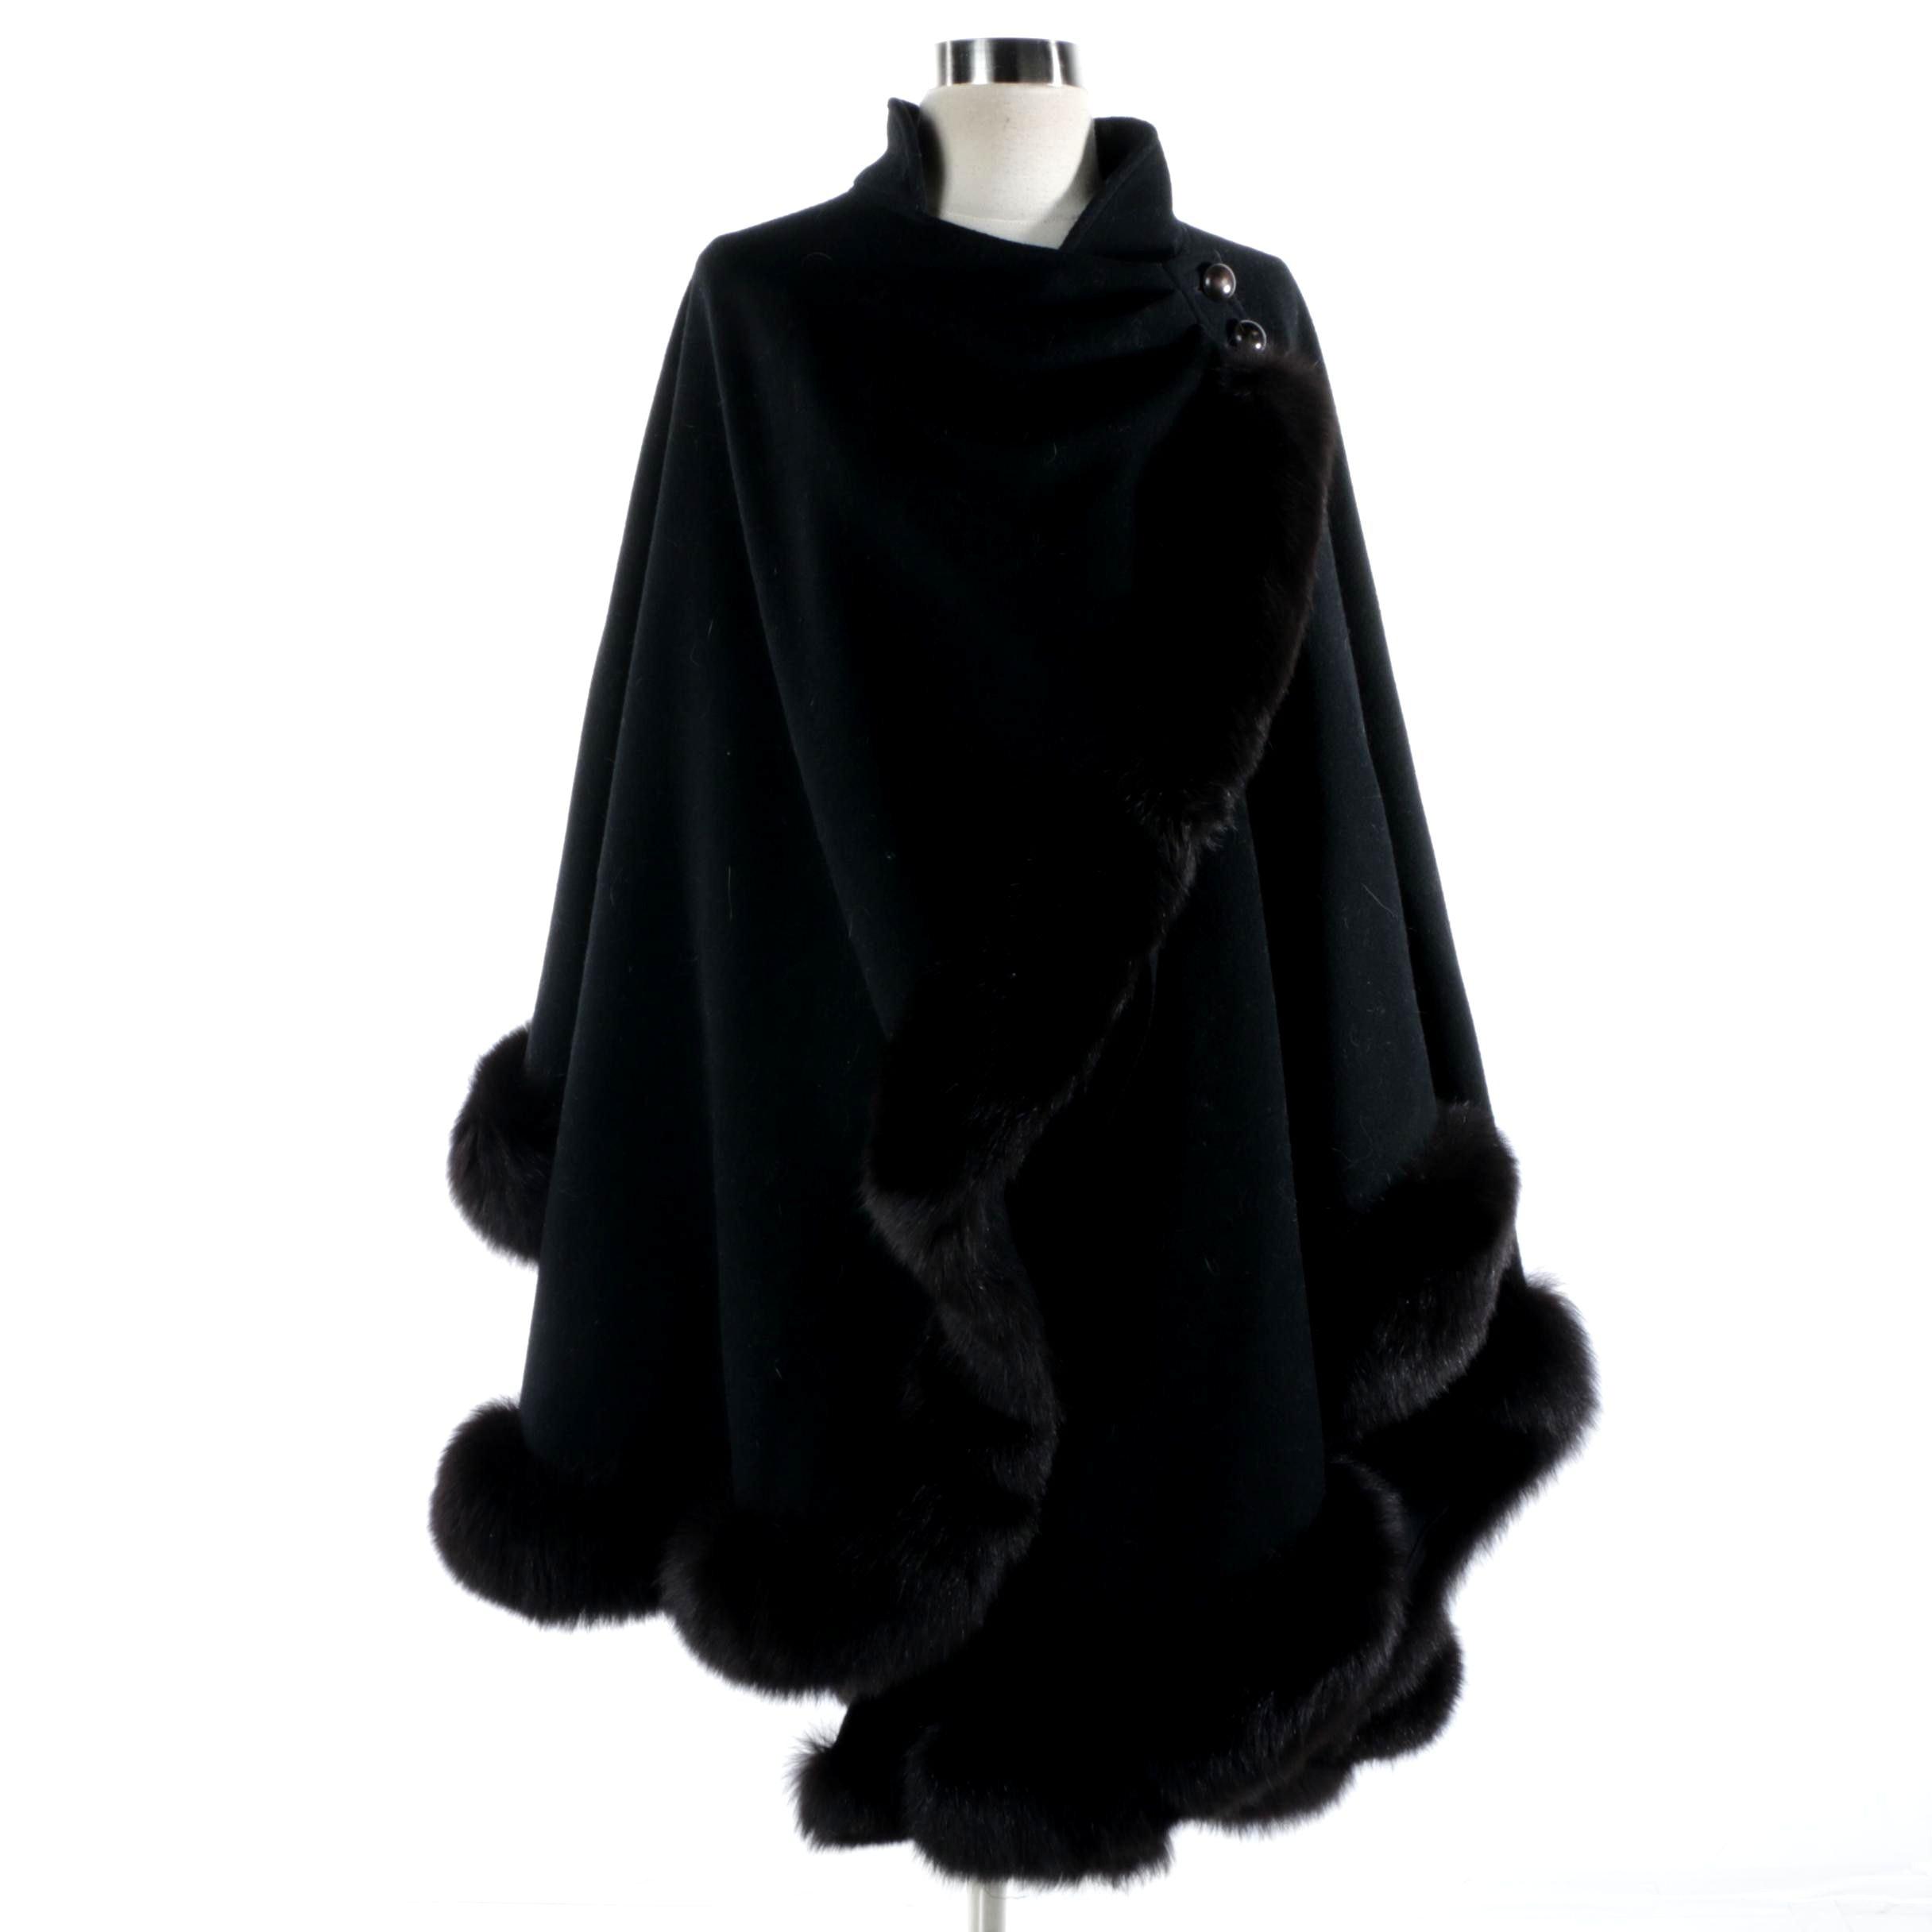 Women's Black Wool Cape With Fox Fur Trim